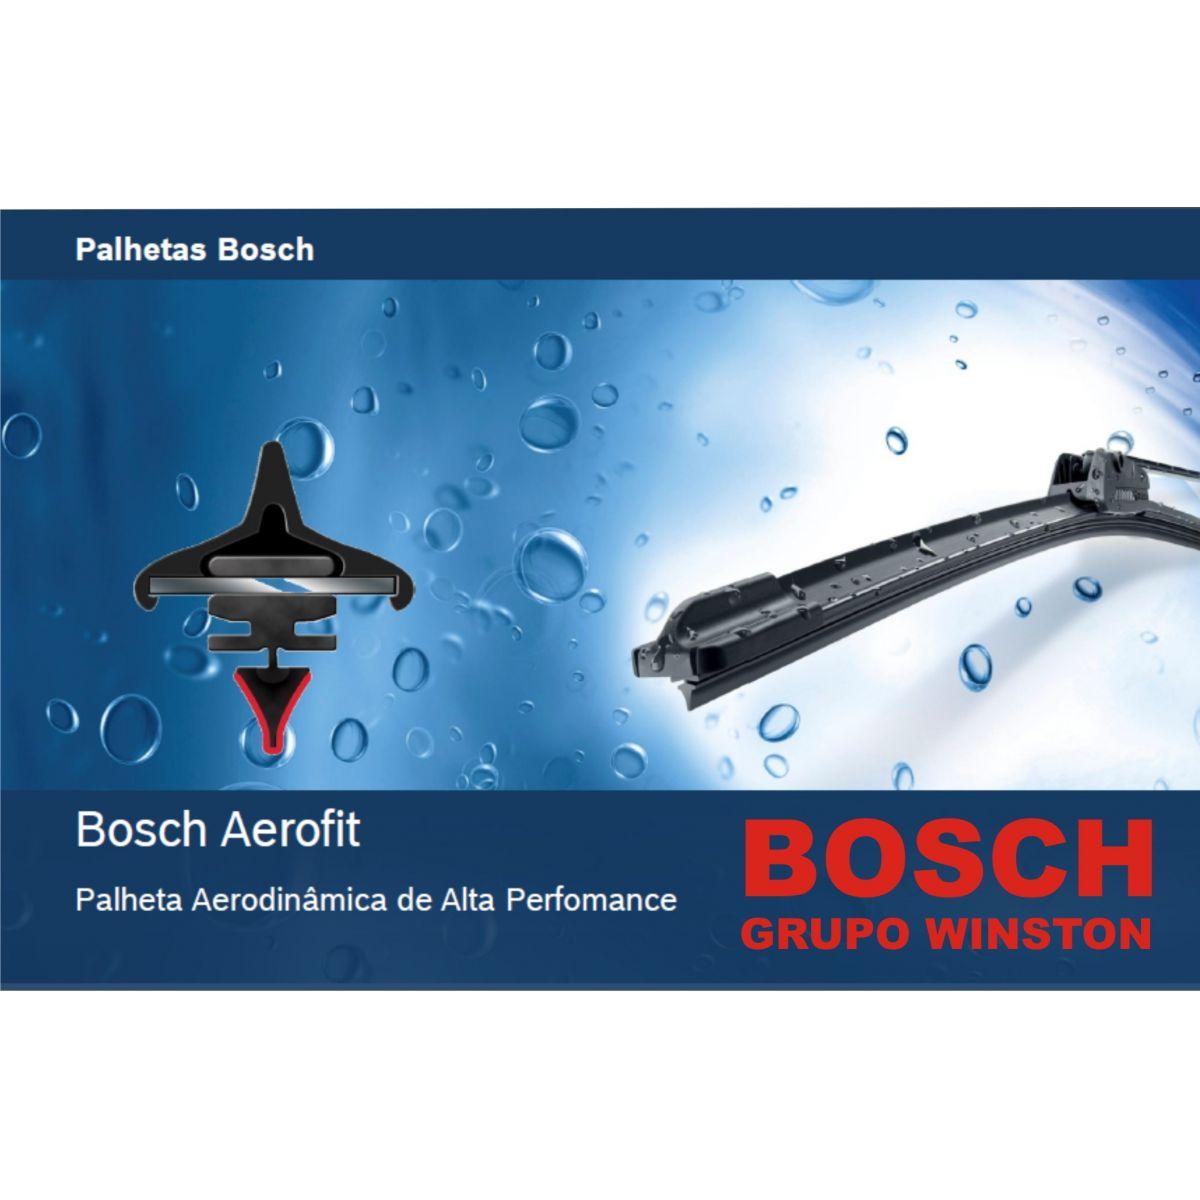 Palheta Bosch Aerofit Limpador de para brisa Bosch Peugeot 307 / SW 807